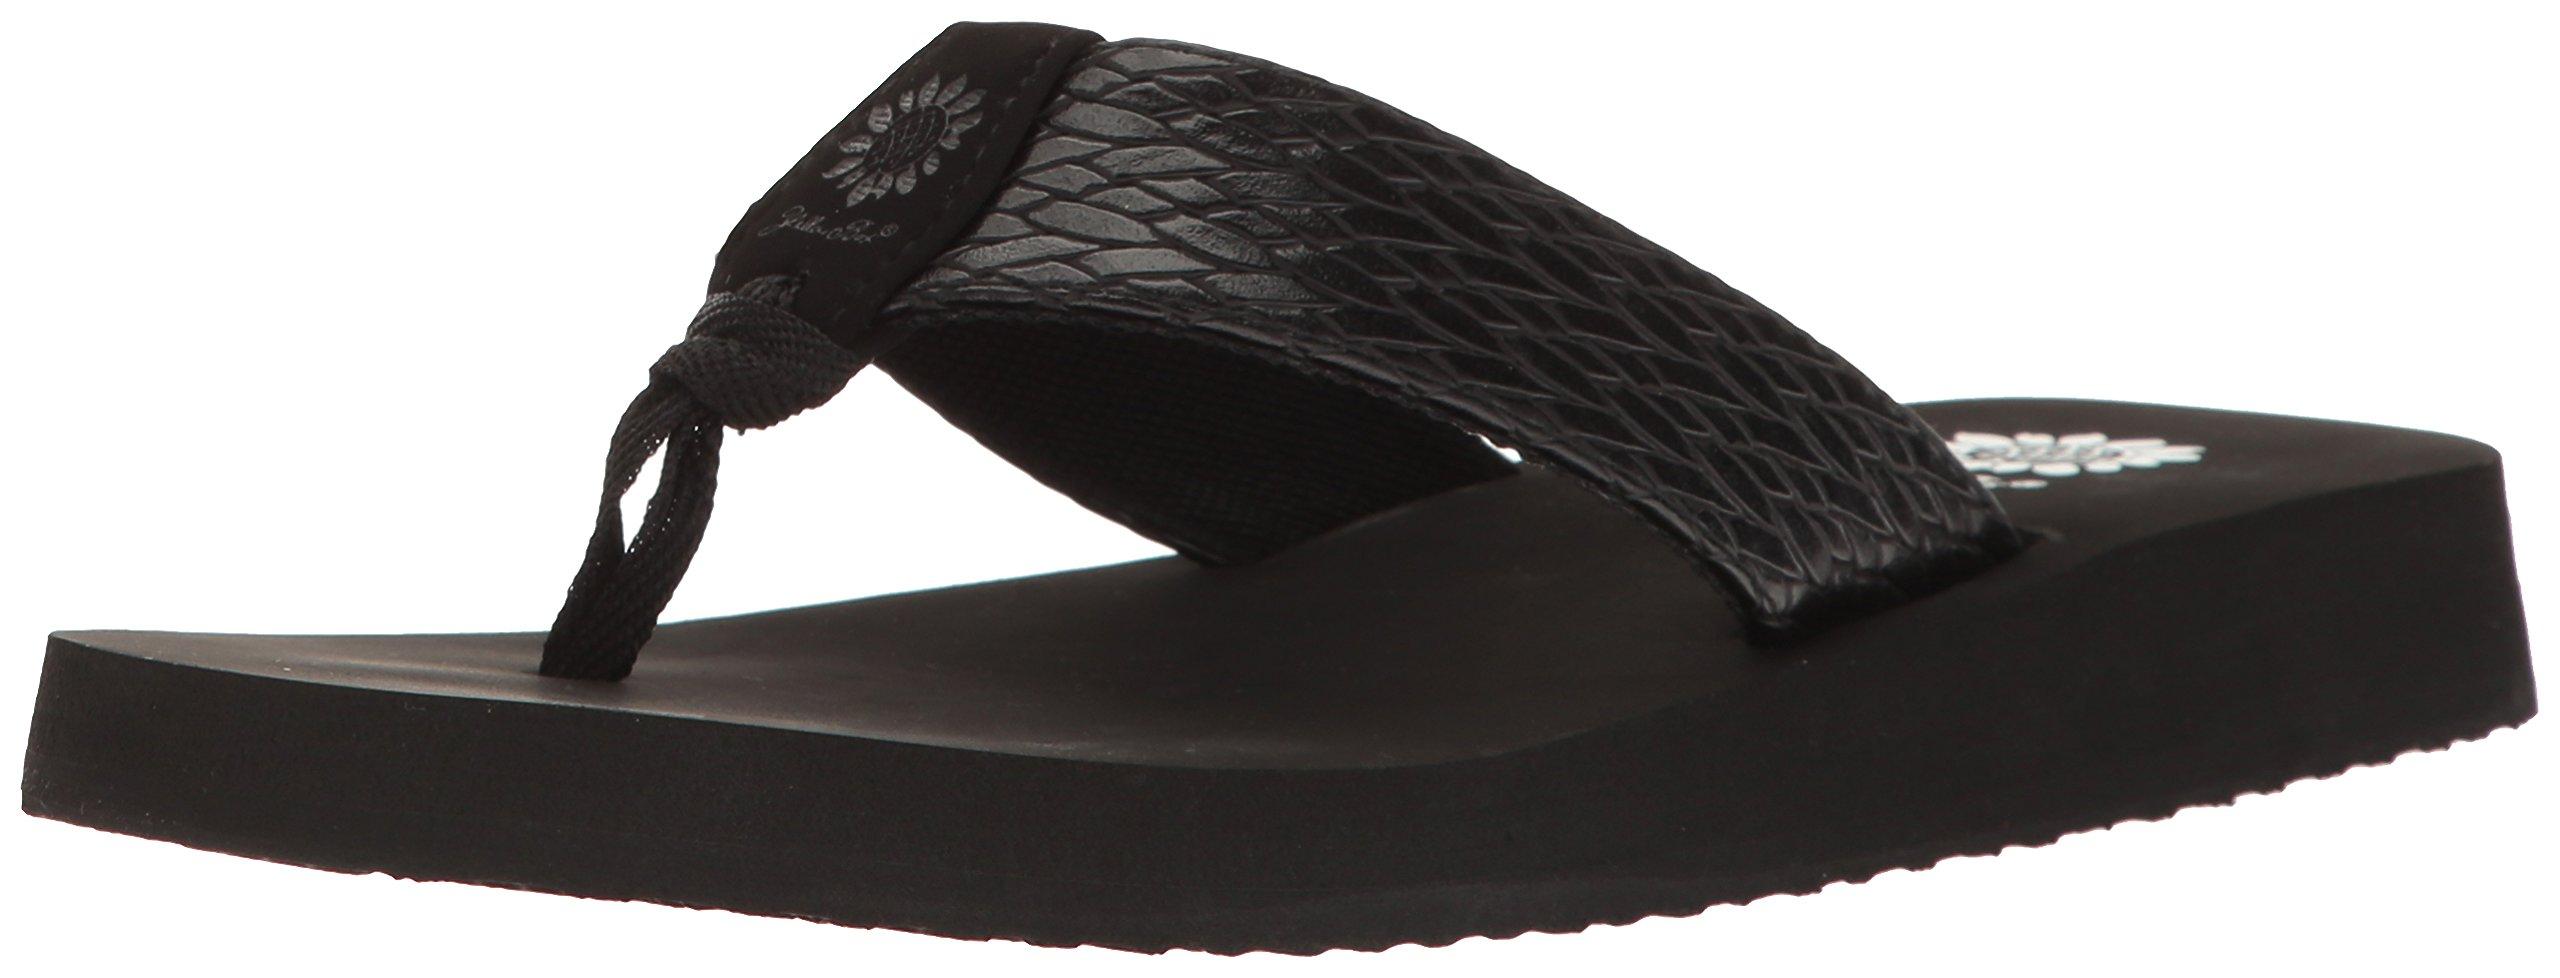 Yellow Box Women's Flax Wedge Sandal, Black, 9 M US